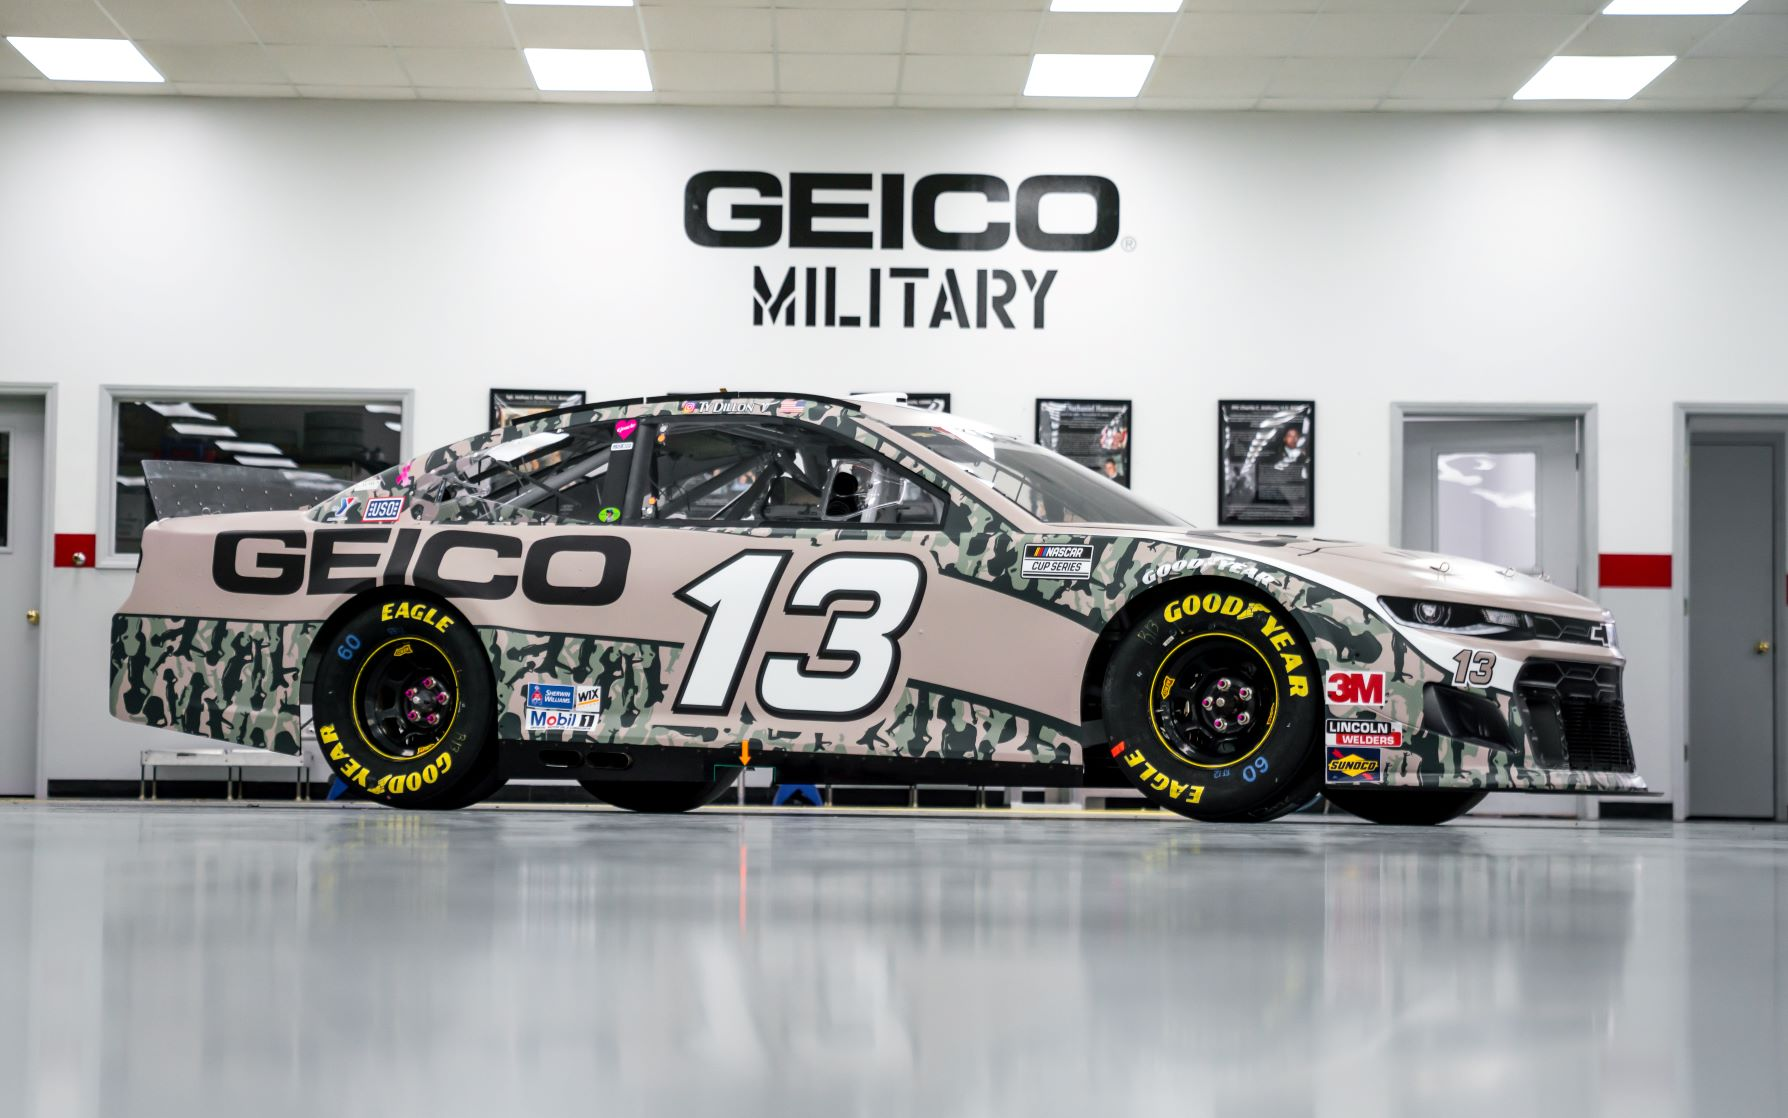 The New RCR NASCAR Geico Military Wrap